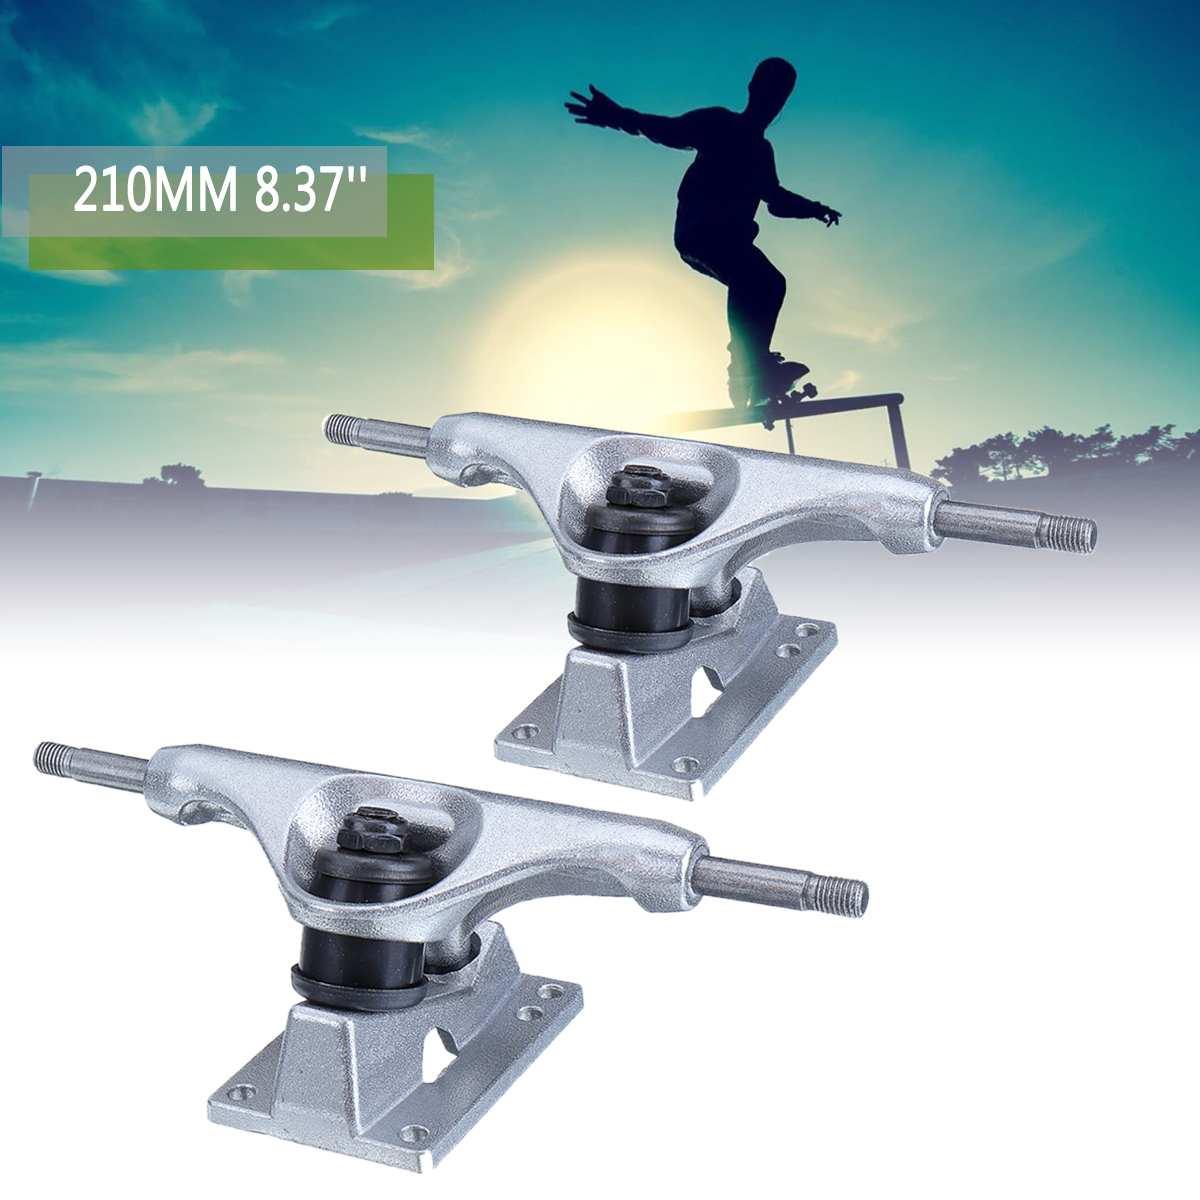 1 Paar 210mm 8,37 ''silber Doppel Rocker Beruf Longboard Lkw Aluminium Elektrische Skateboard Aufhänger Teile Skate Bord Zahlreich In Vielfalt